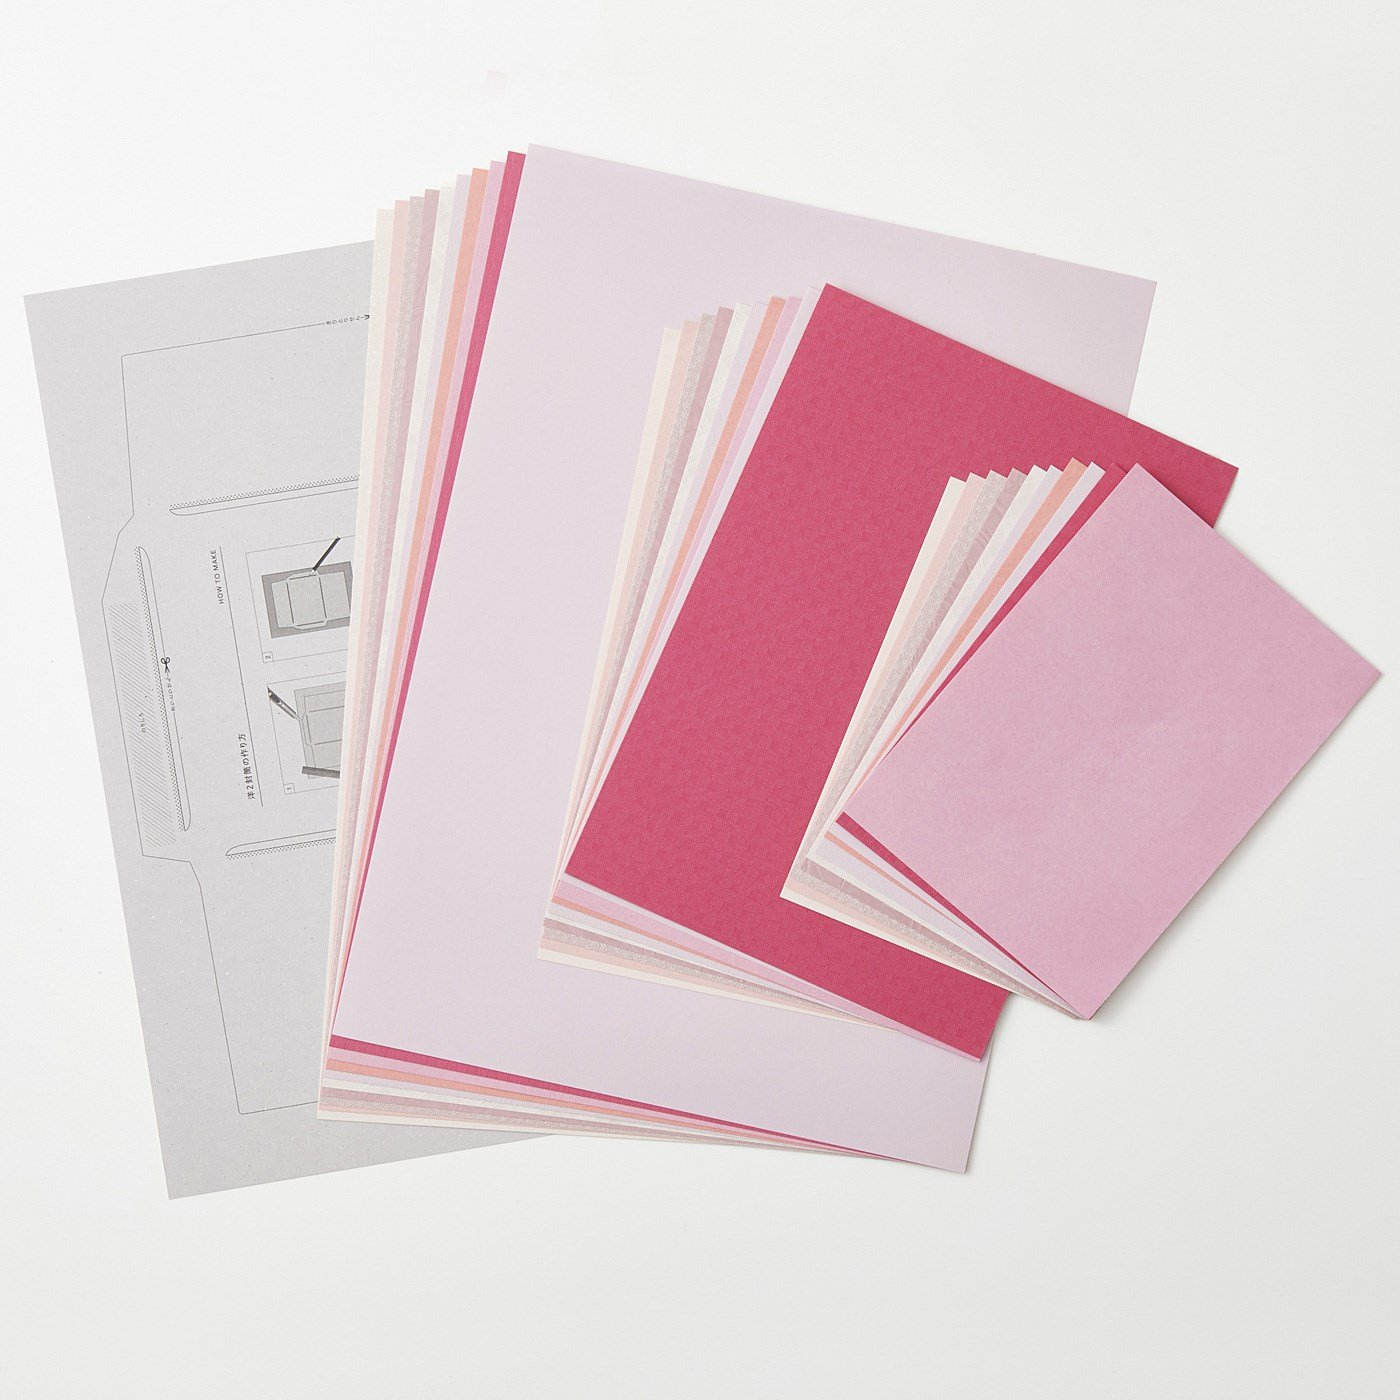 OSYAIRO 紙の専門商社竹尾が選ぶ 色を楽しむ紙セットの会〈桃〉